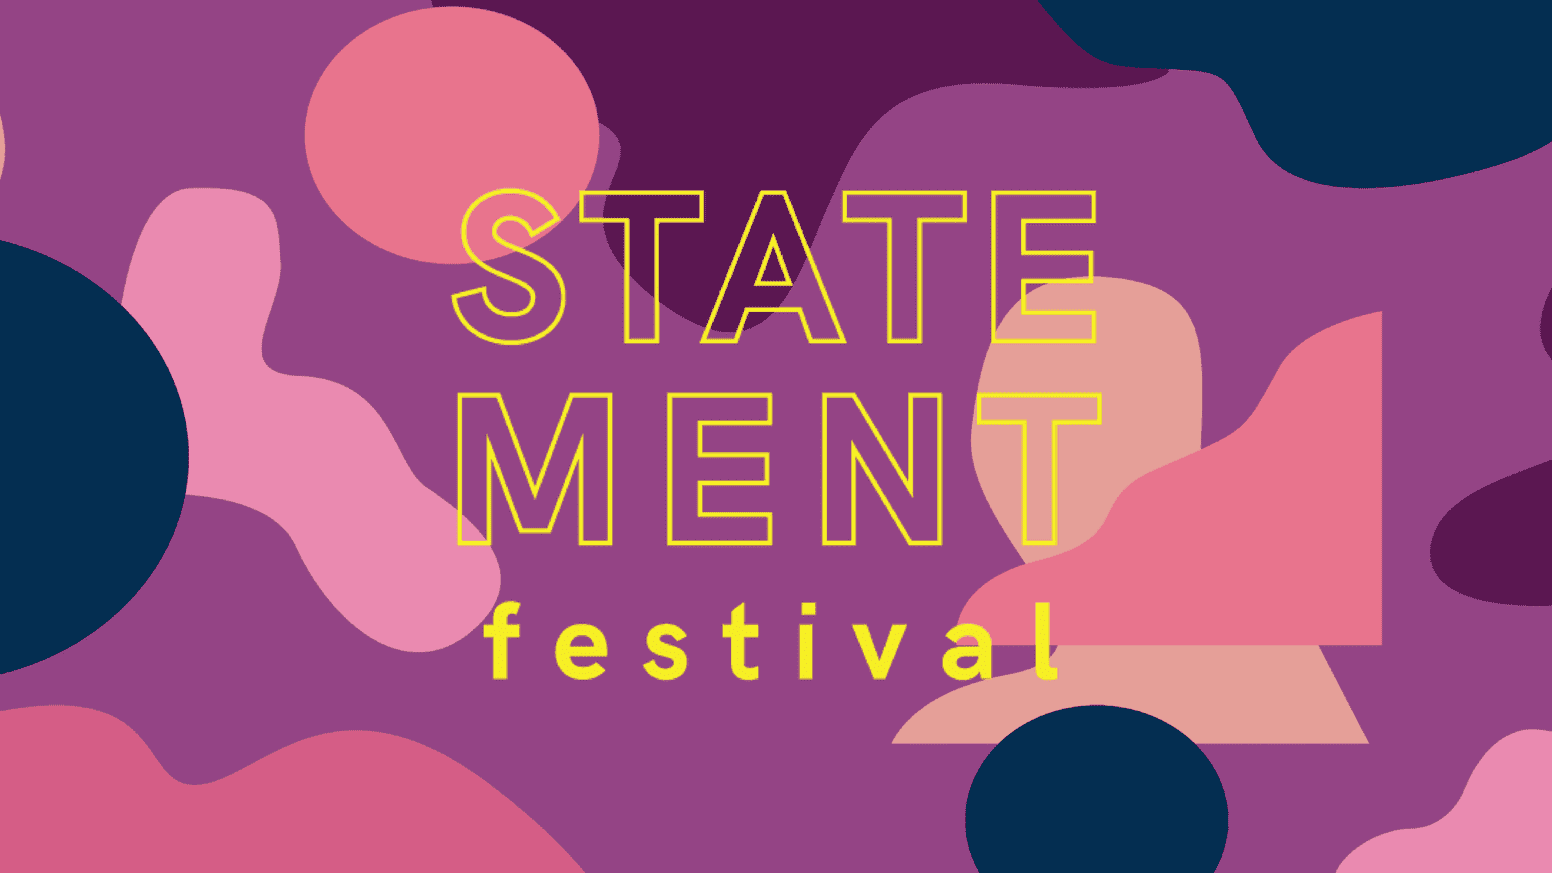 festival de música statement festival